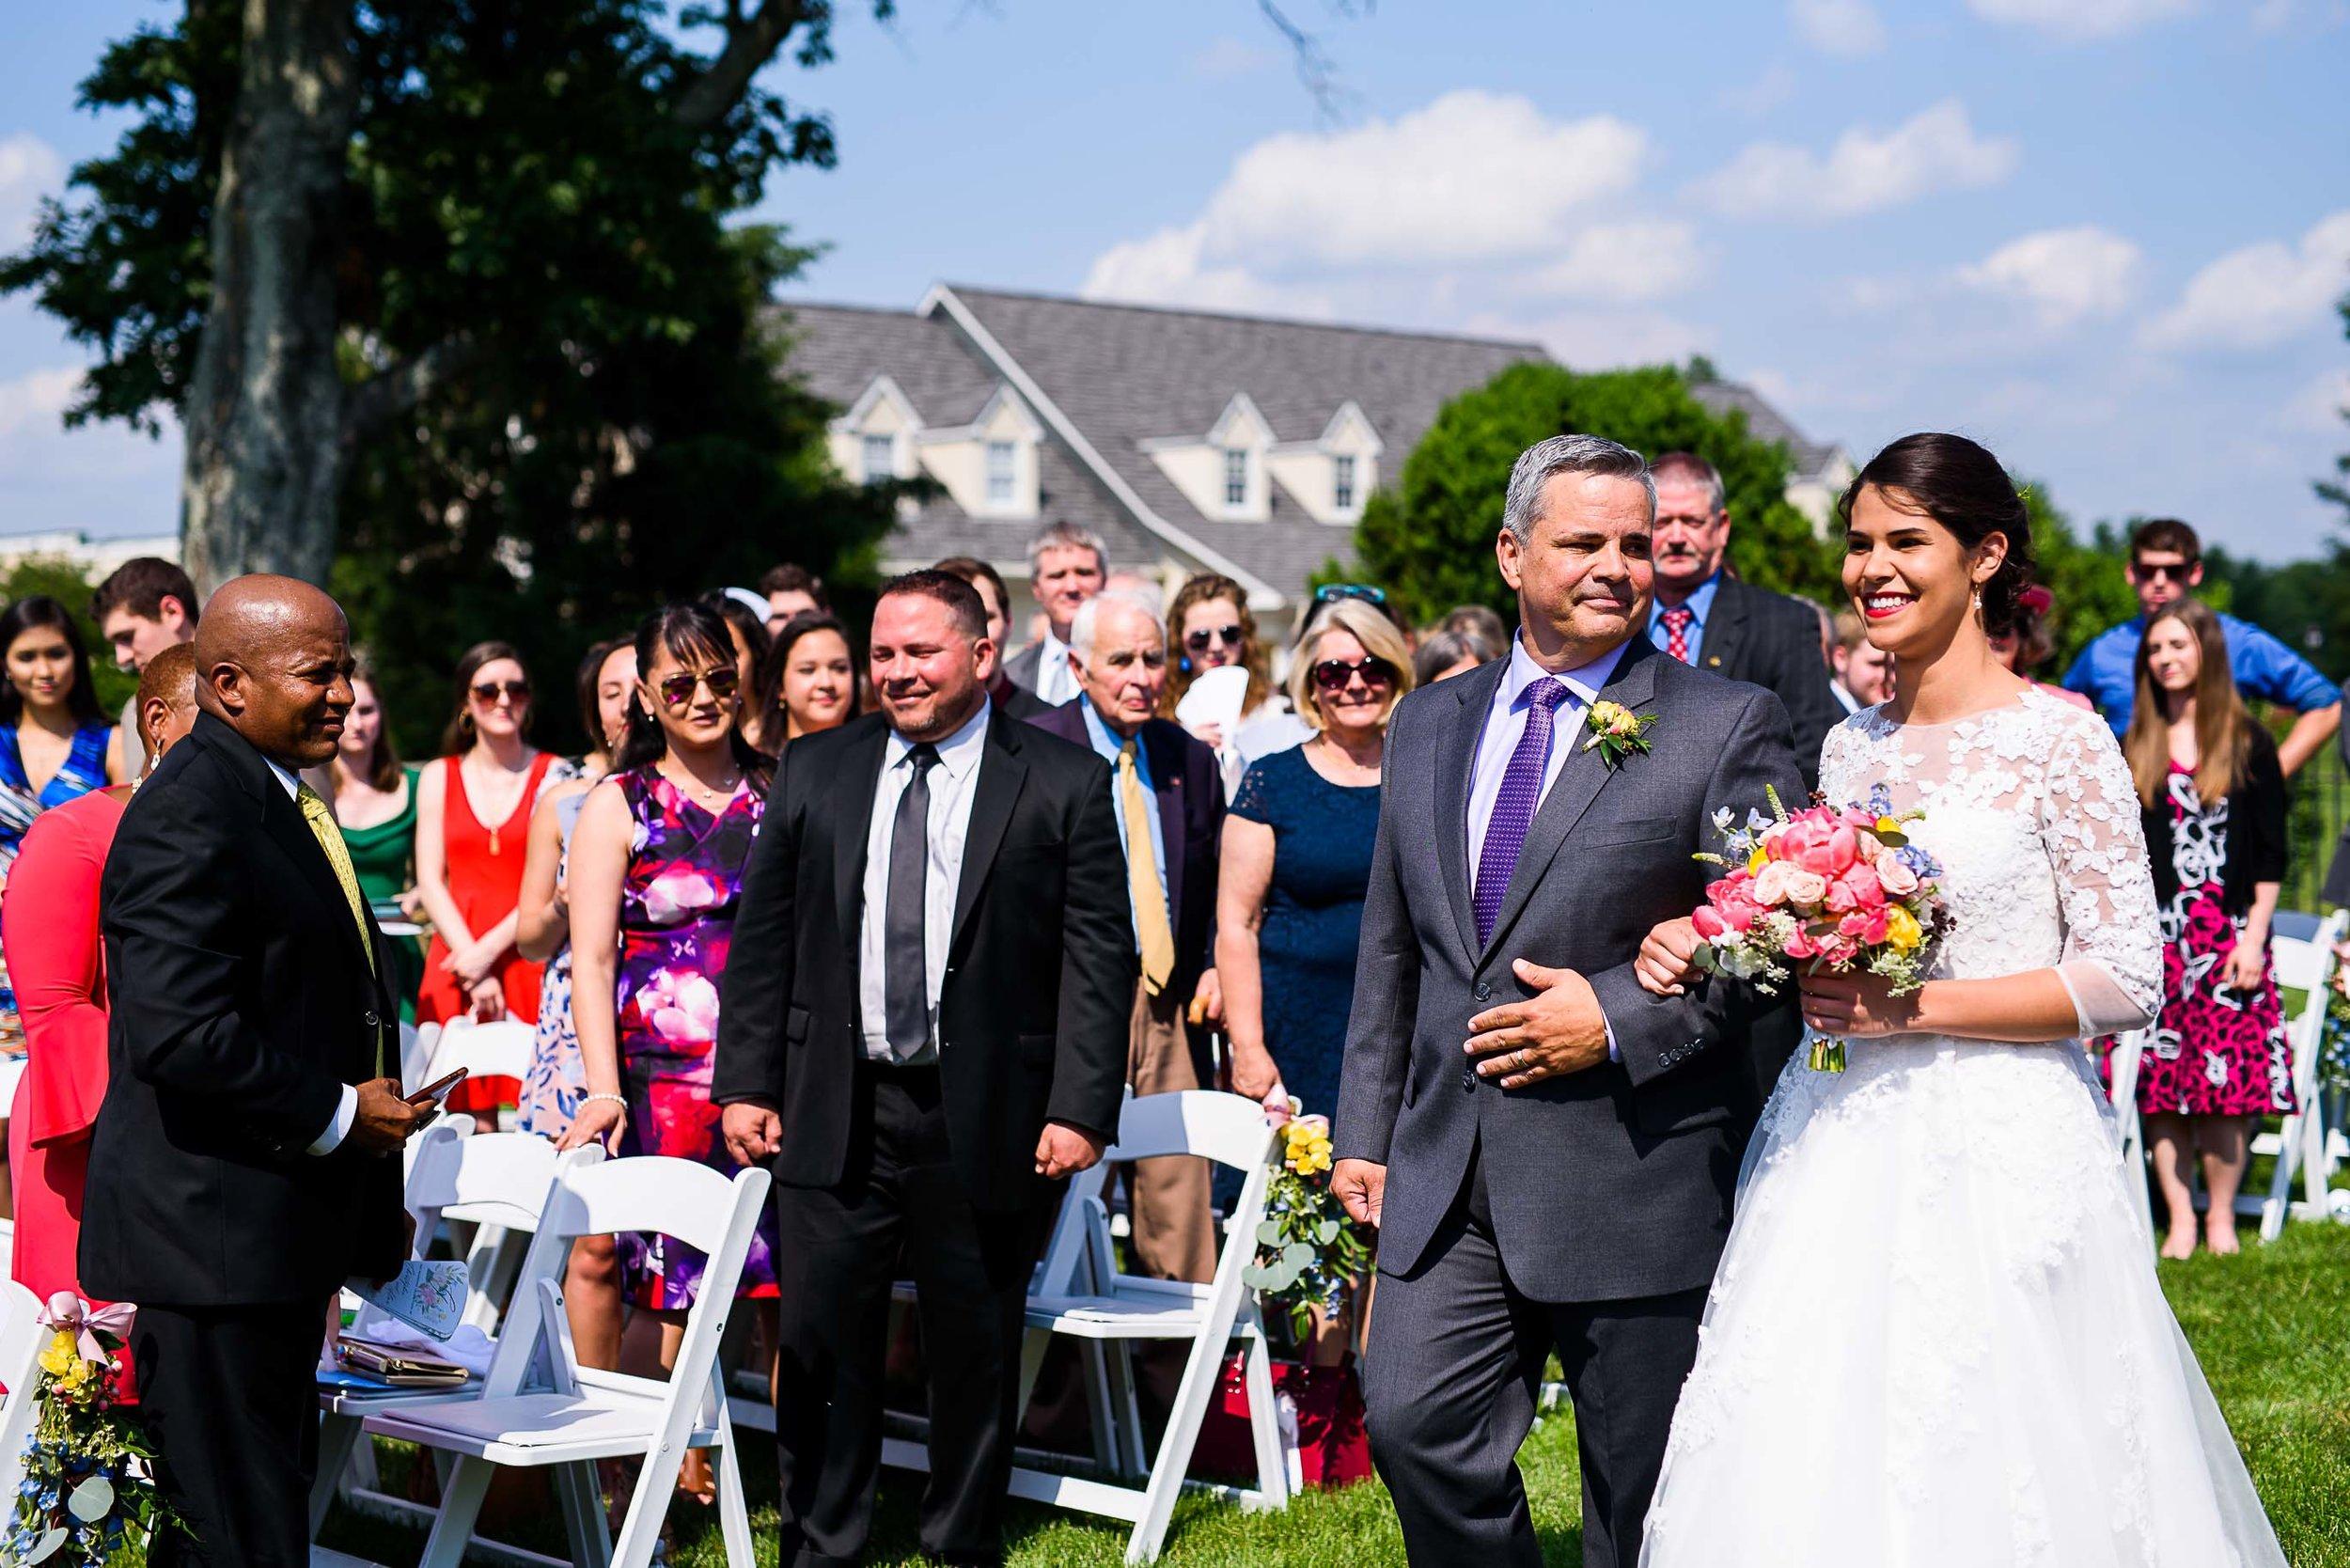 Evergreen Country Club wedding photos38.jpg